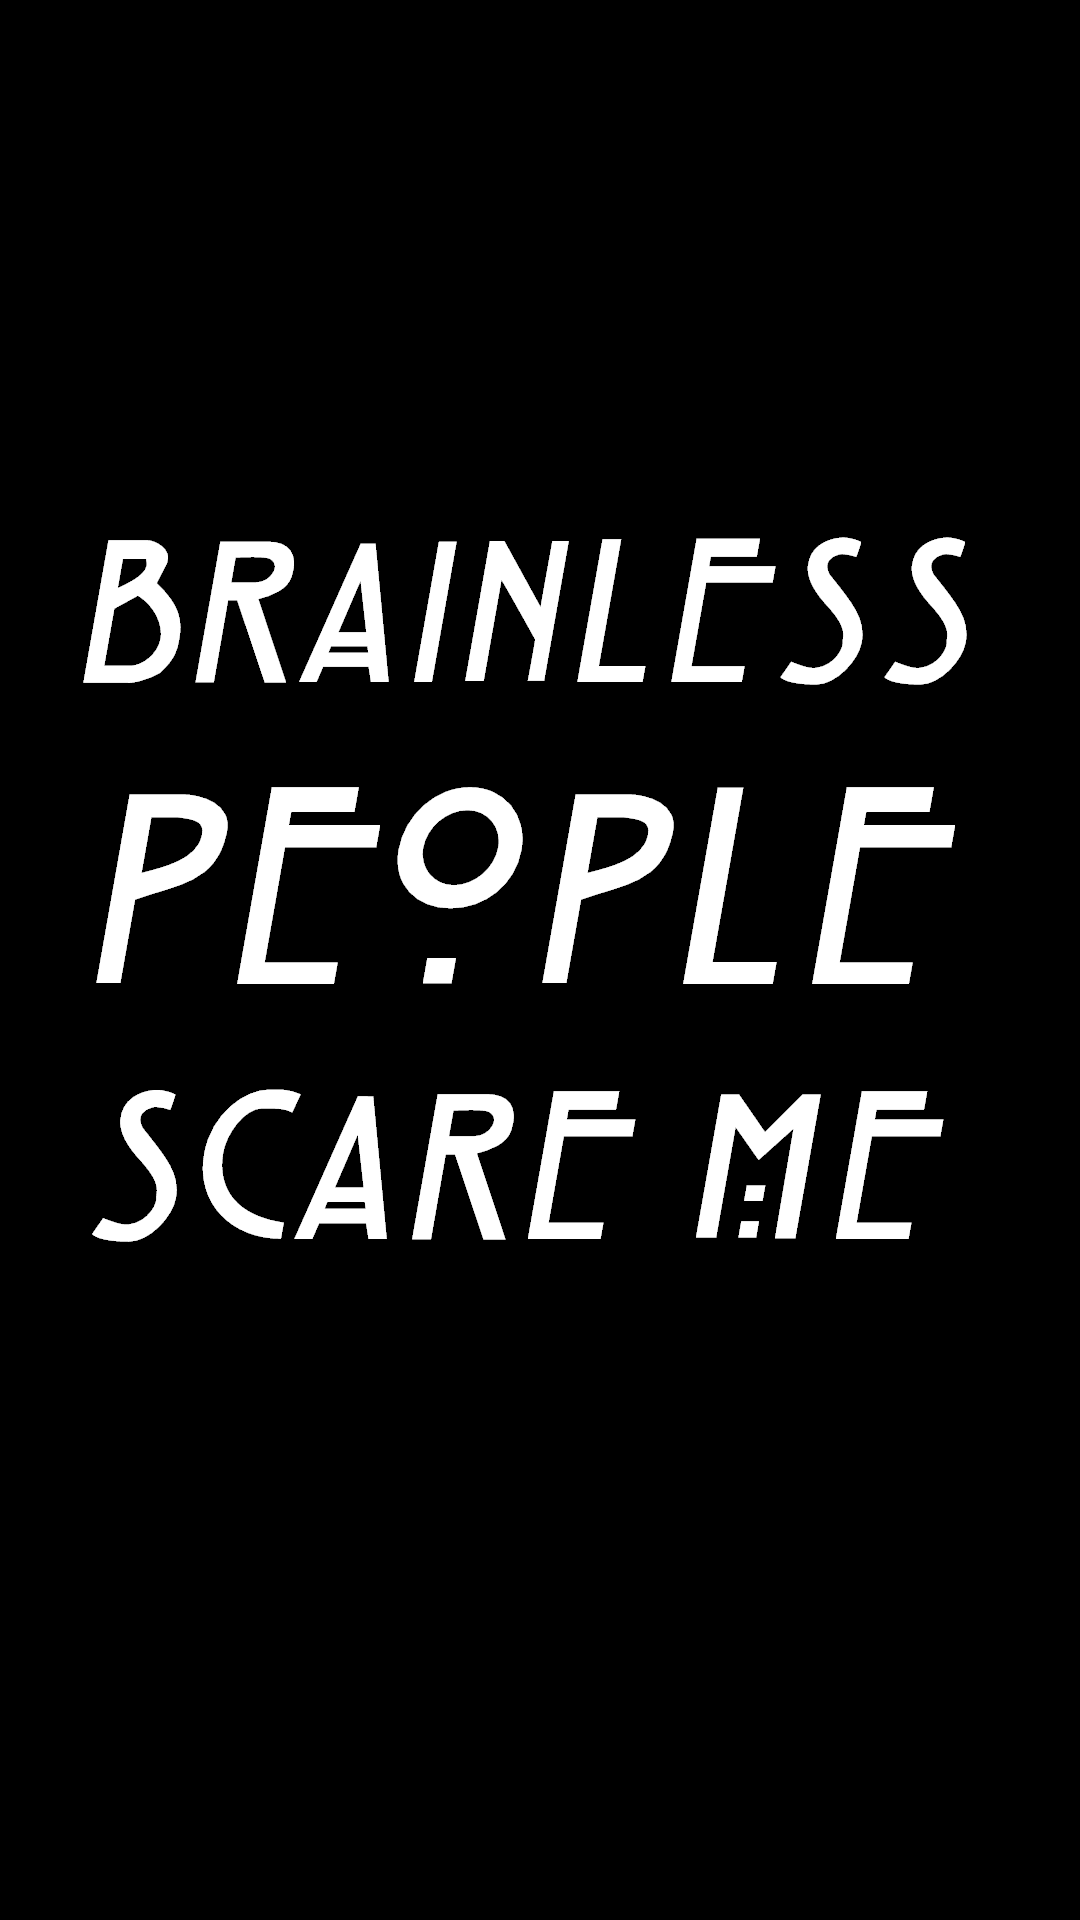 Brainless People Scare Me Hd Phone Wallpaper Or Lockscreen Hd Phone Wallpapers I Am Scared Phone Wallpaper